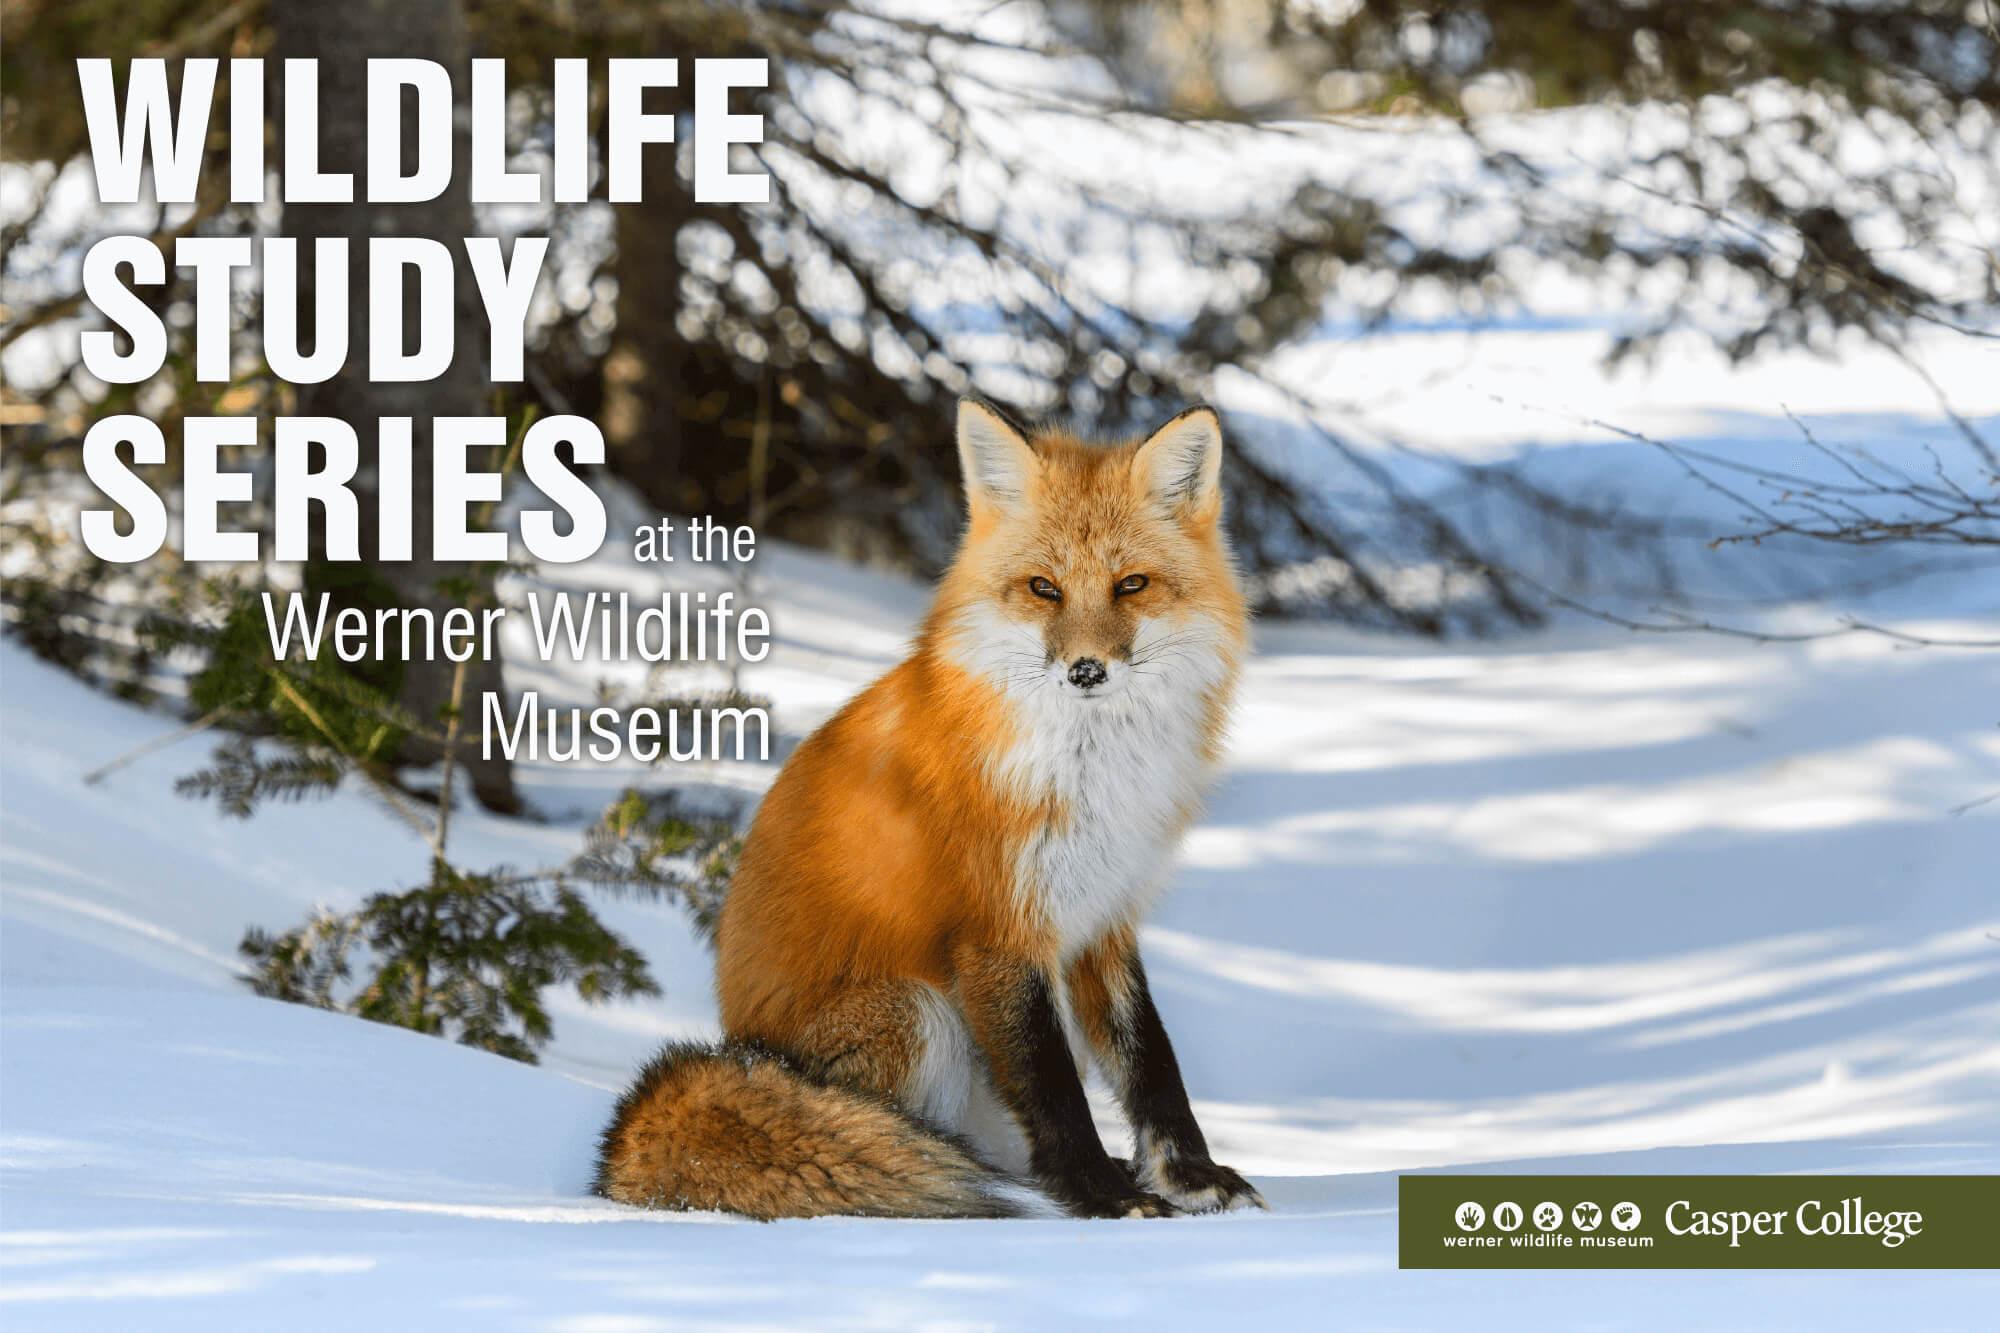 red fox sitting in snow